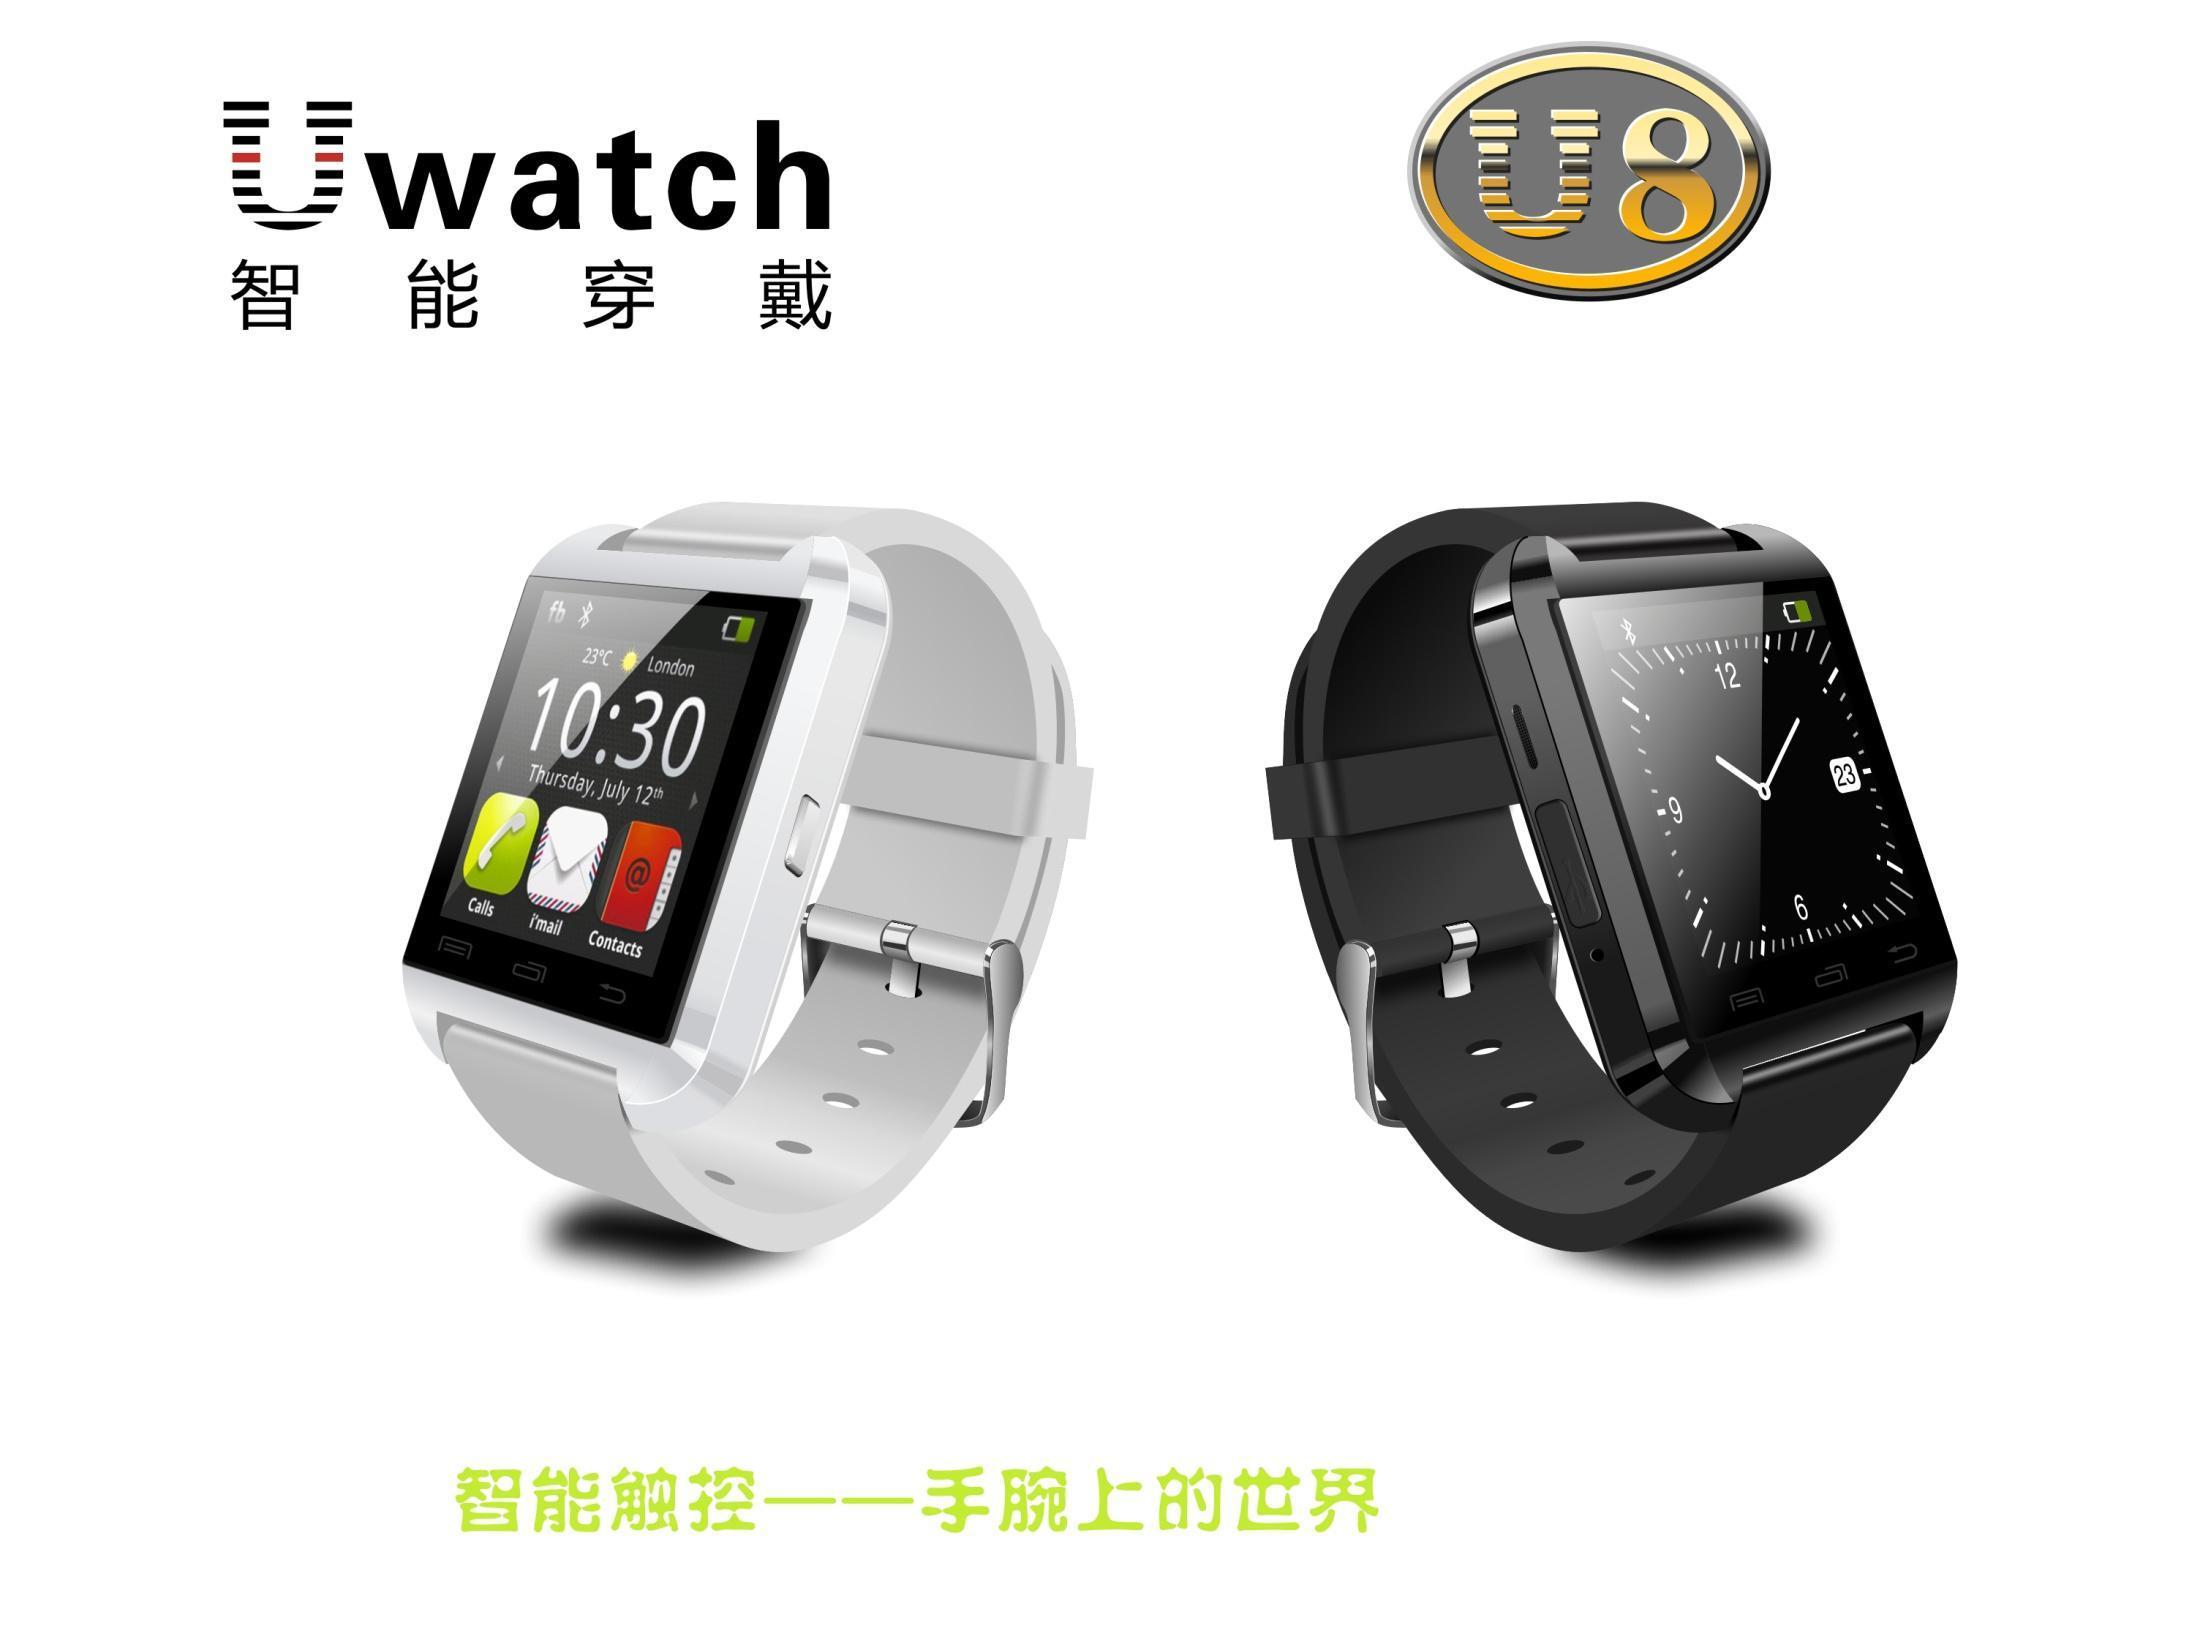 U8 Wrist Smart Digital Health Automatic Watch with Bluetooth Bracelets